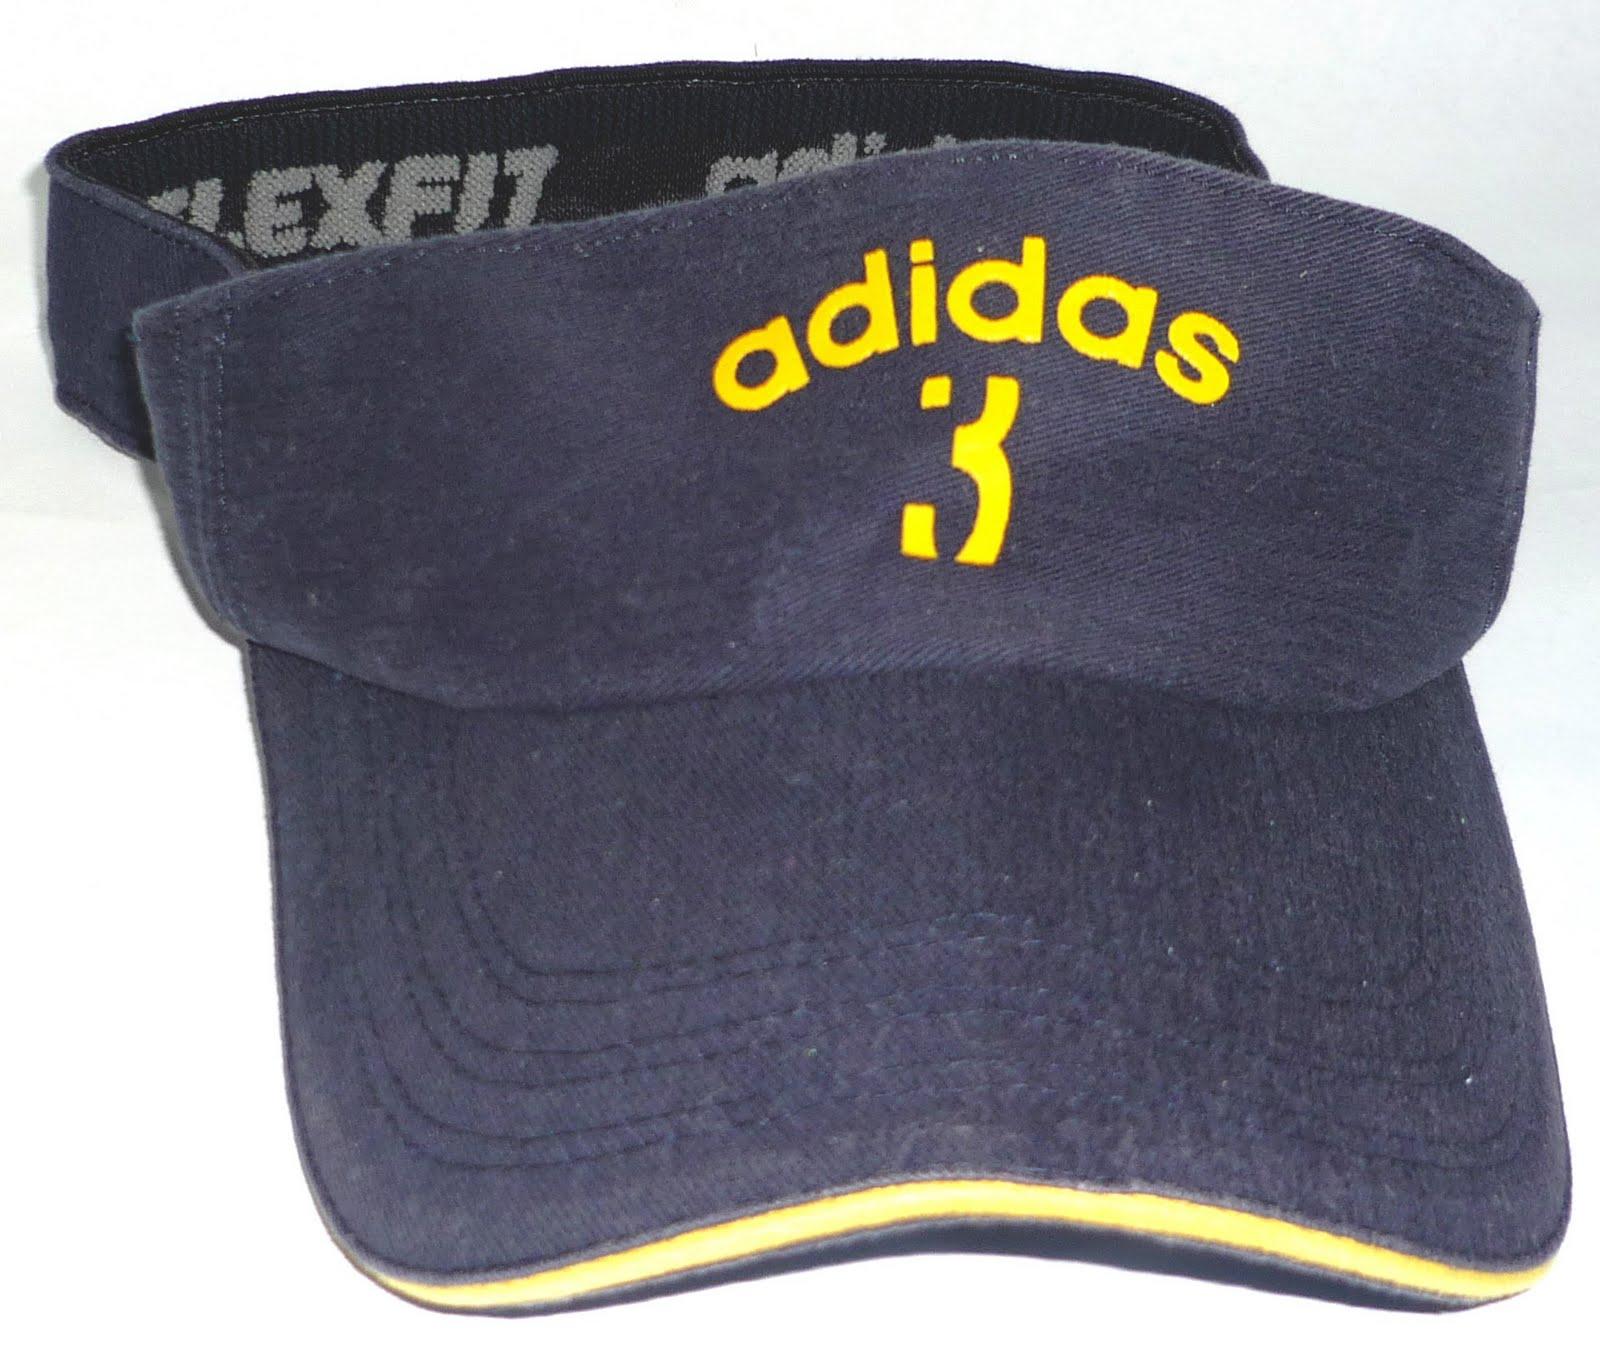 c0e3c52c816 RCHYbundle  used branded cap